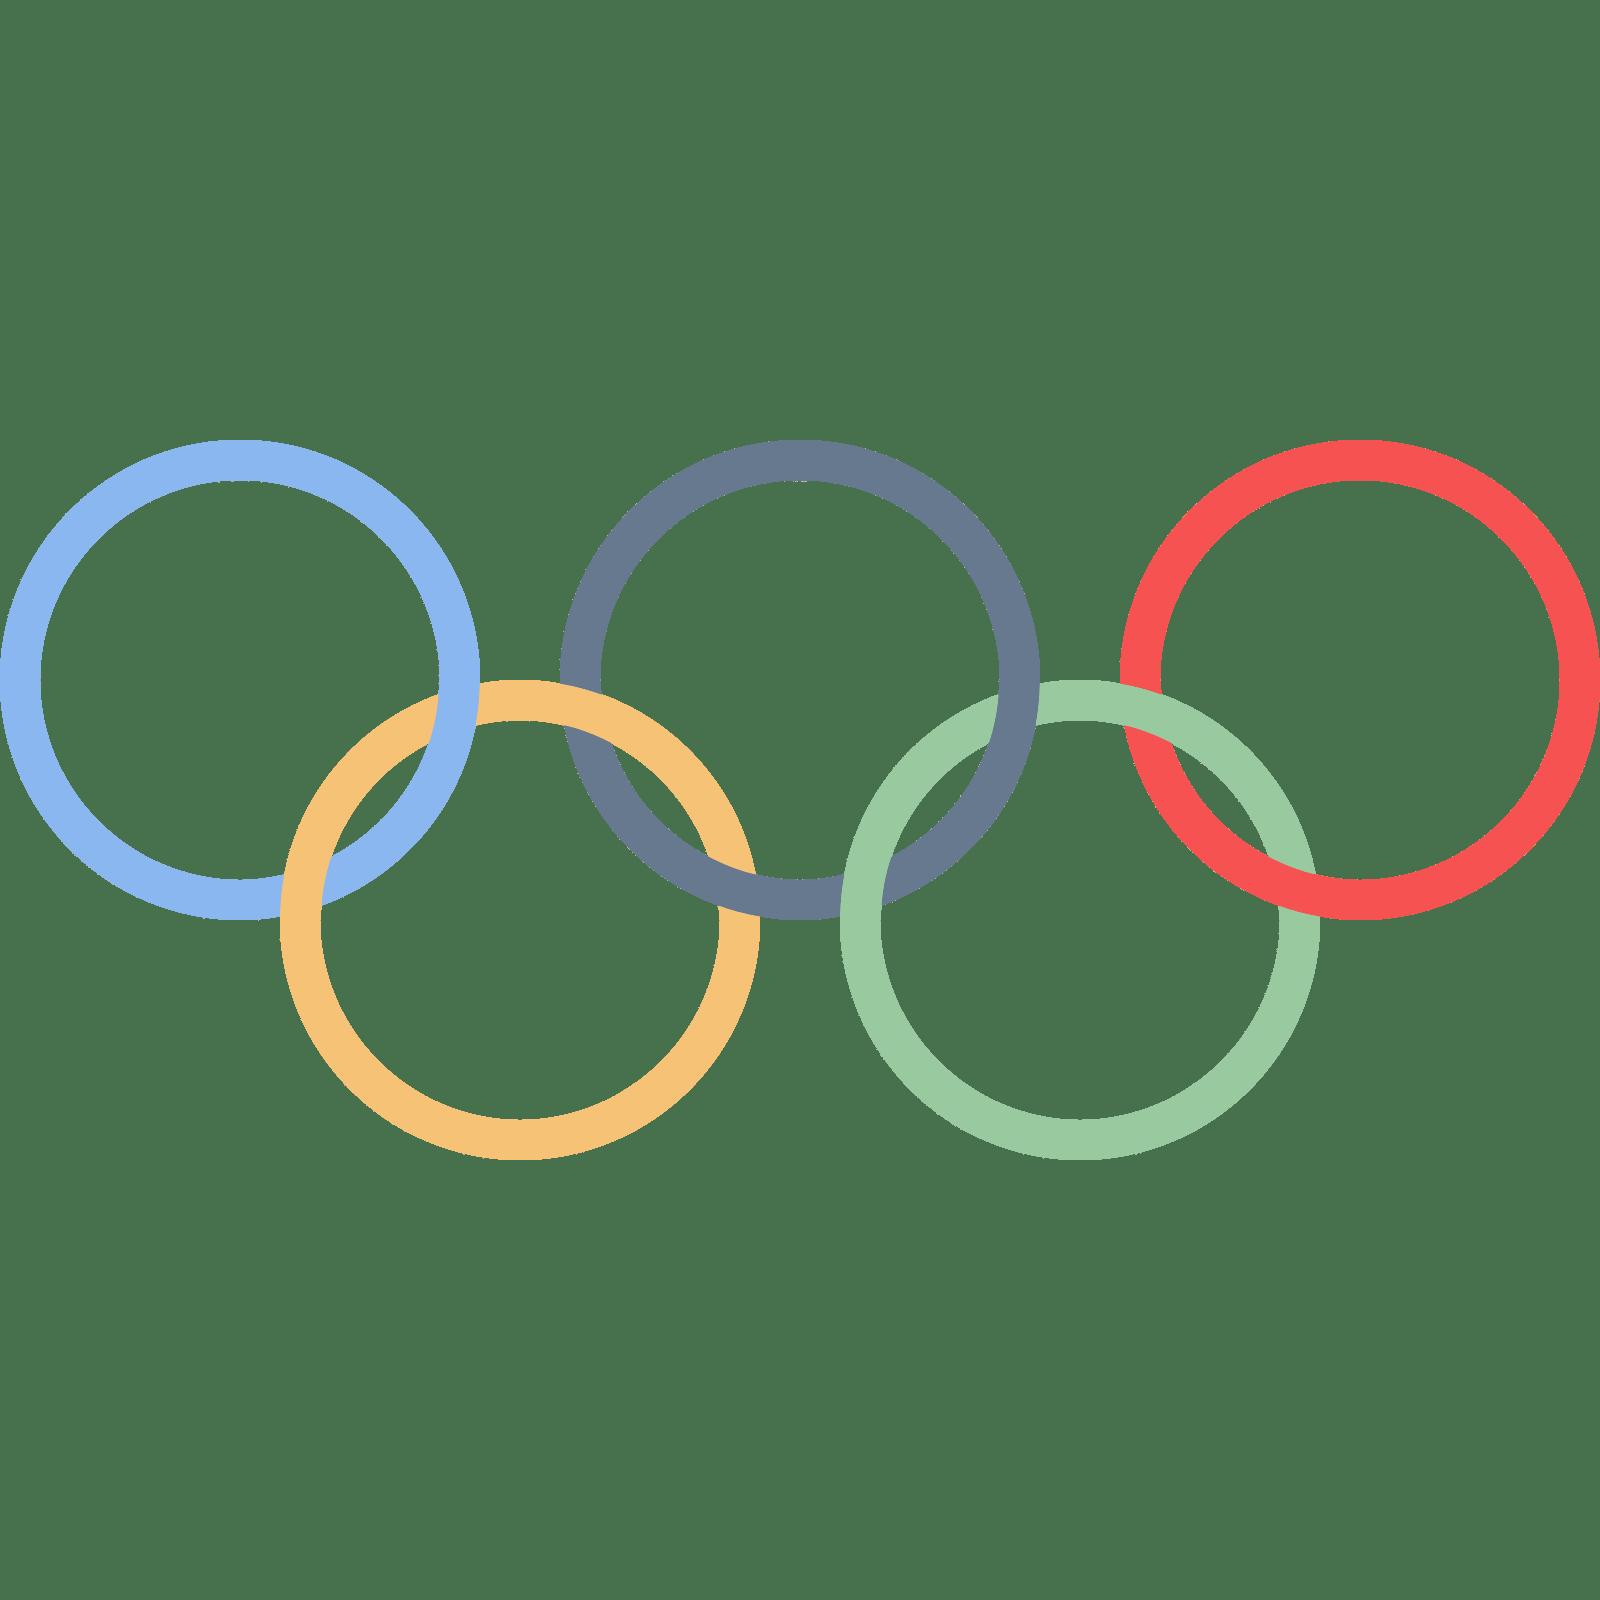 1600x1600 Olympic Rings Clip Art